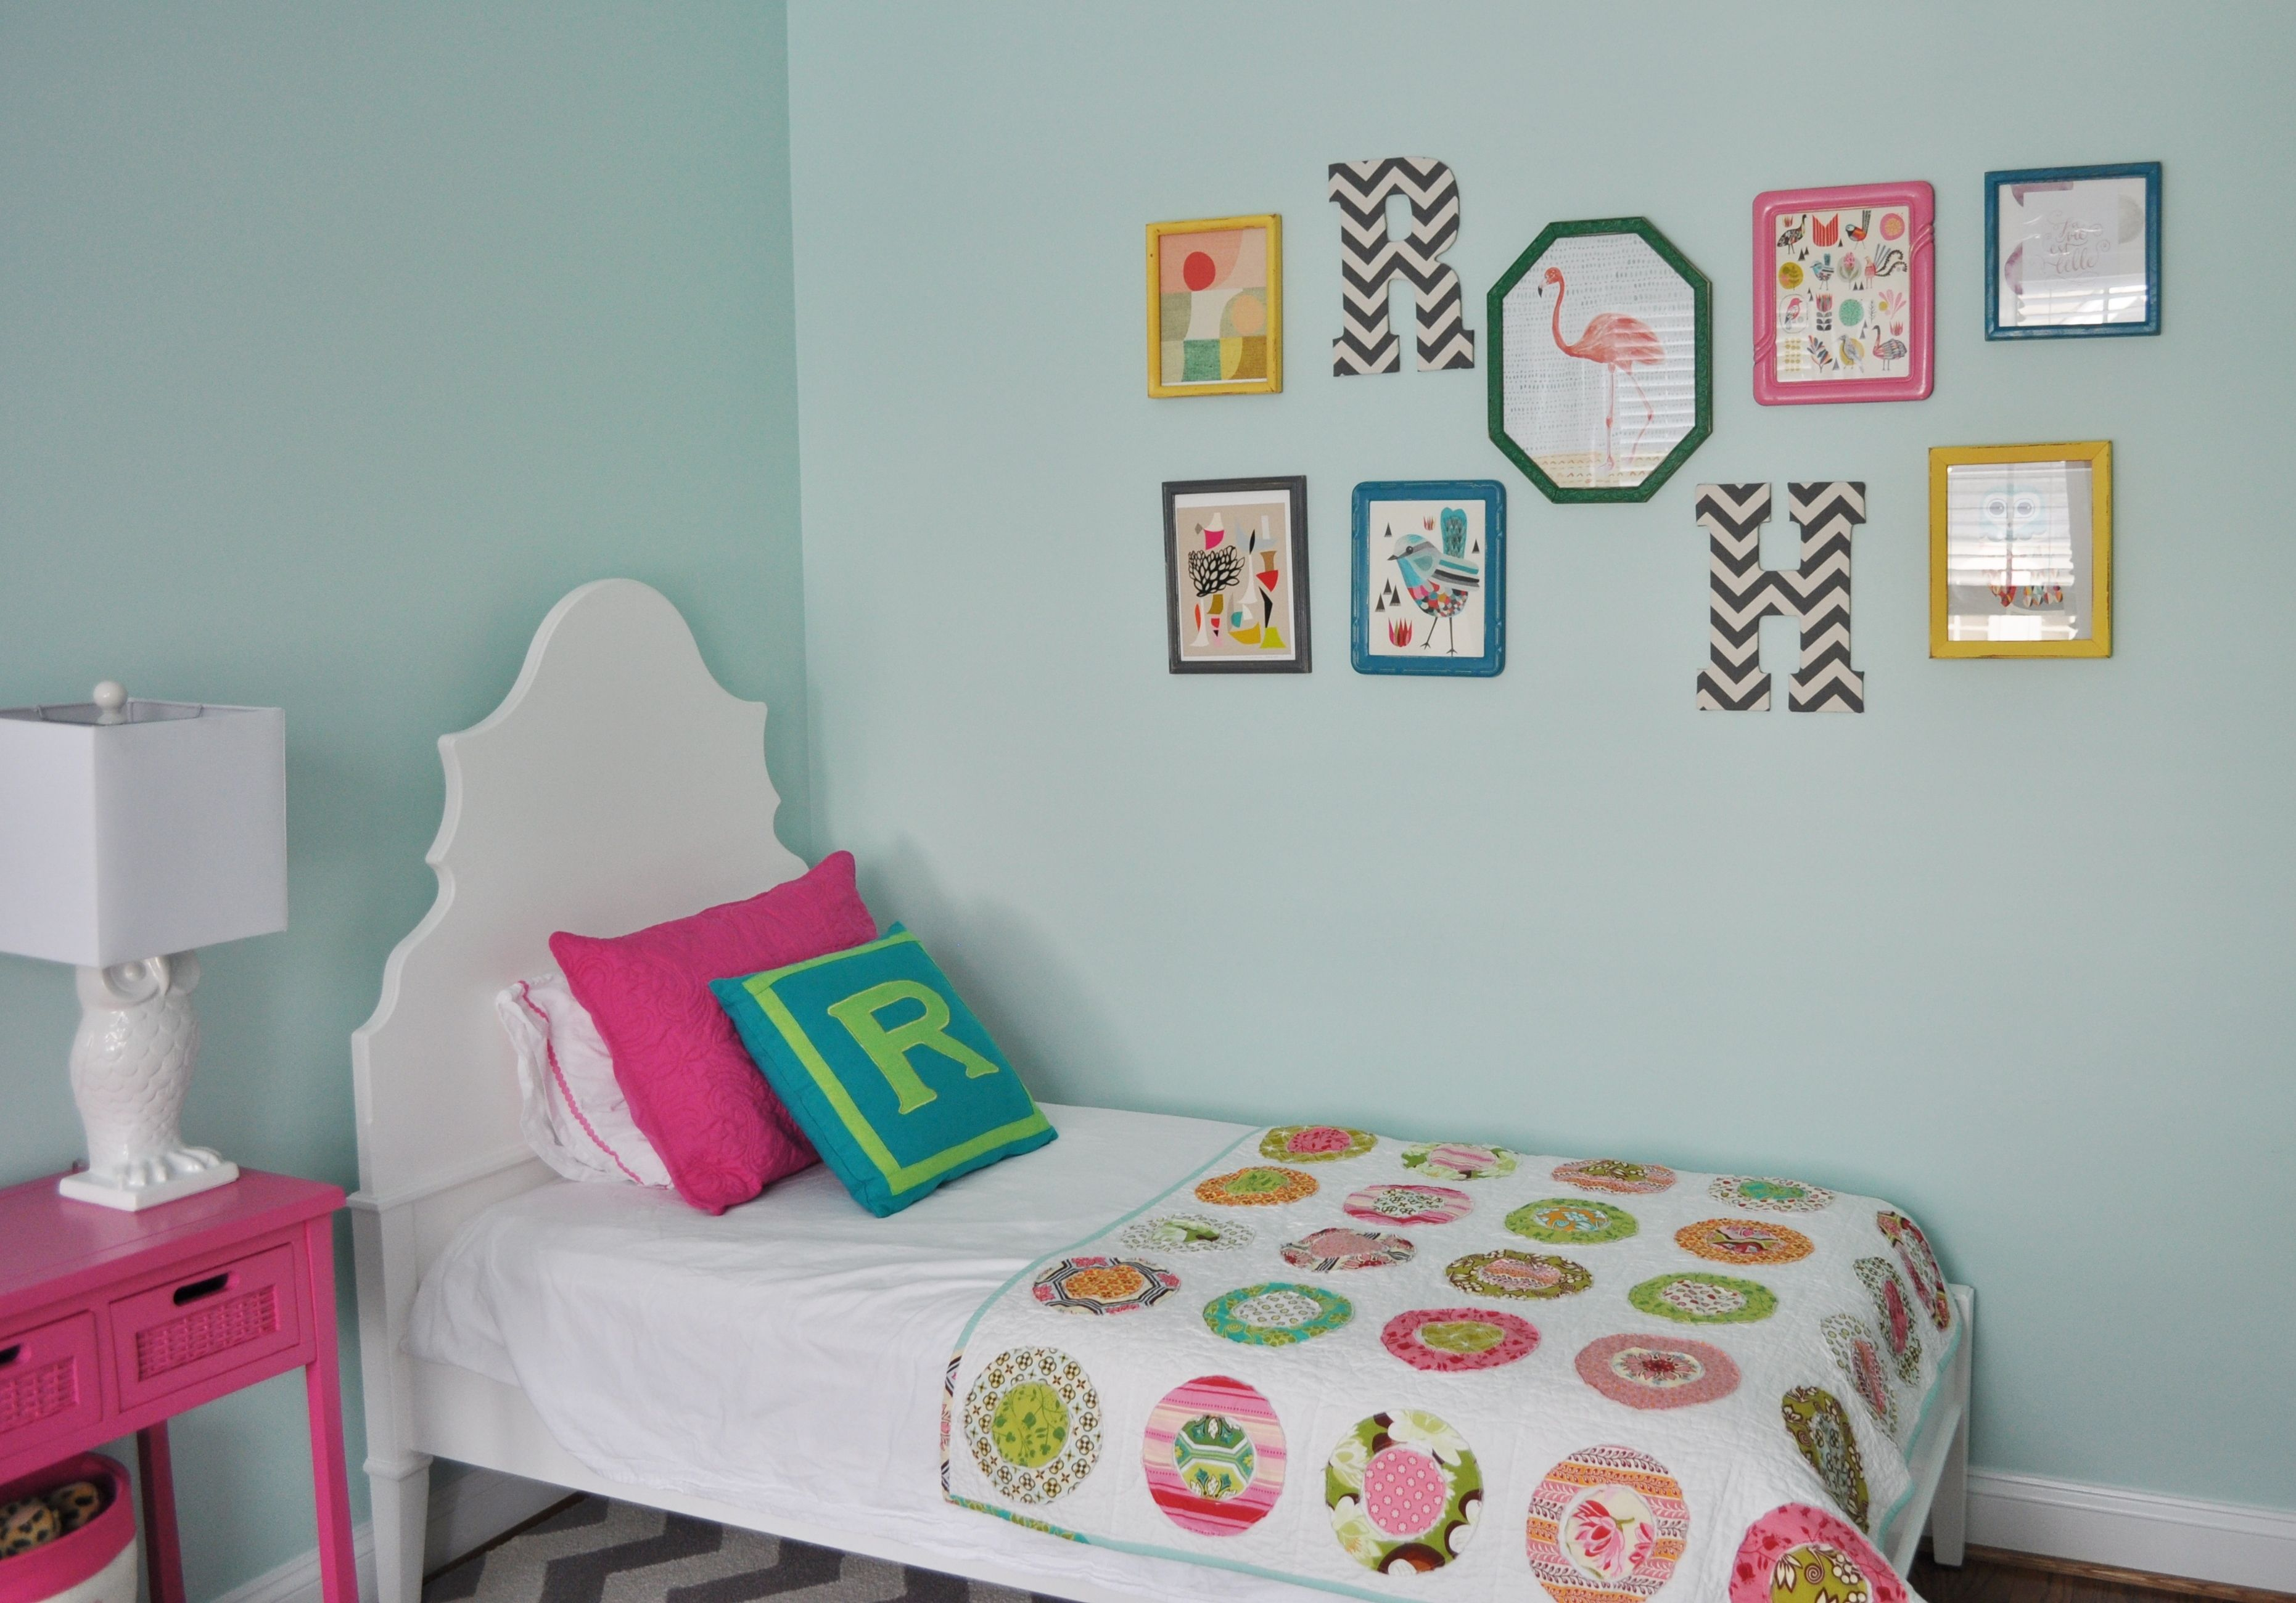 Eclectic girls bedroom wall art wwwjws interiorscom Eclectic